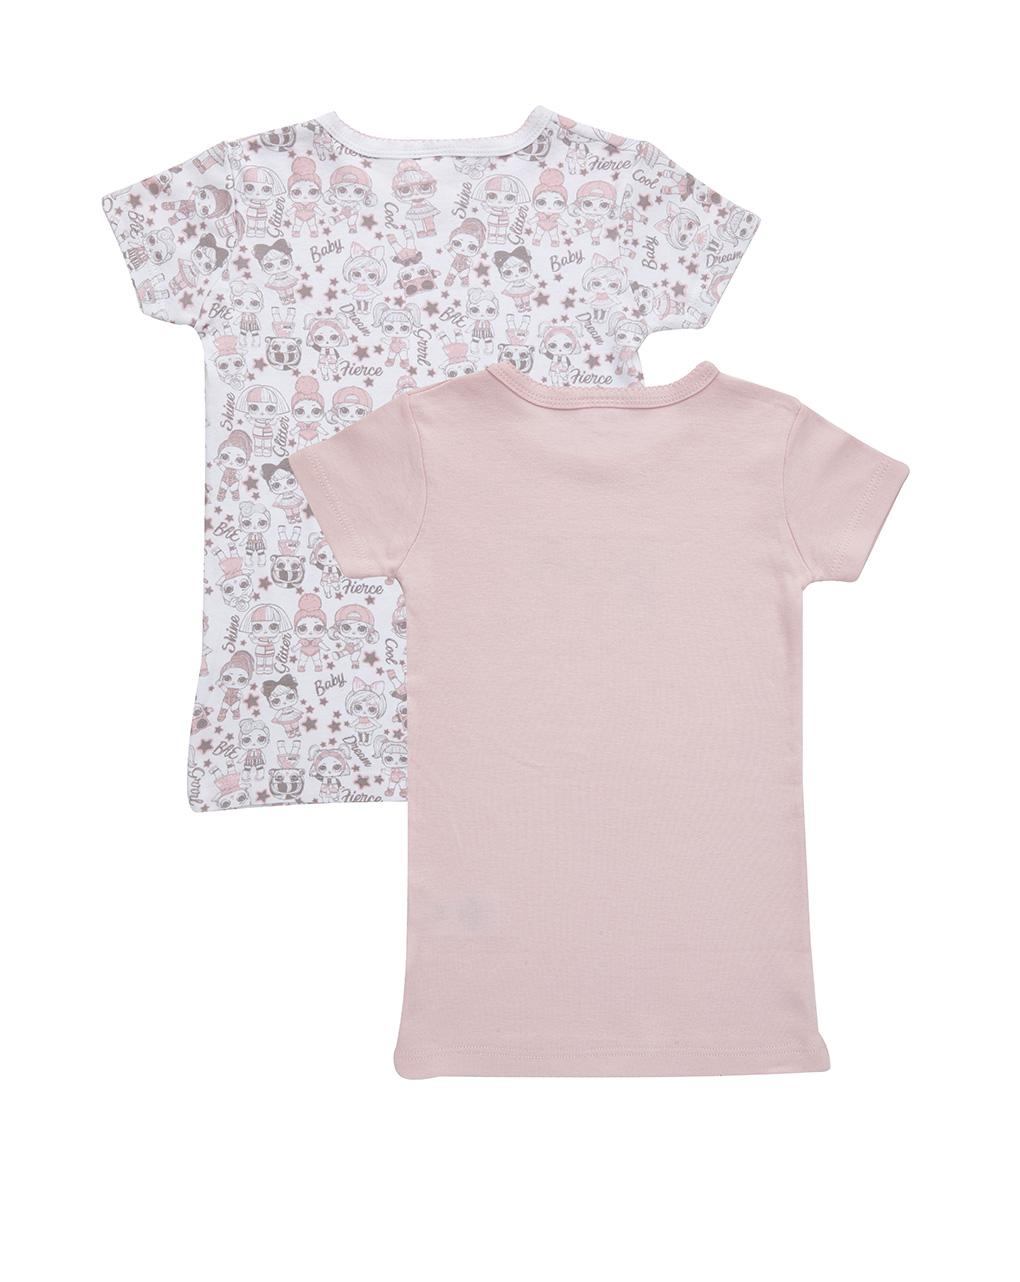 Pack 2 t-shirt stampa lol - Prénatal